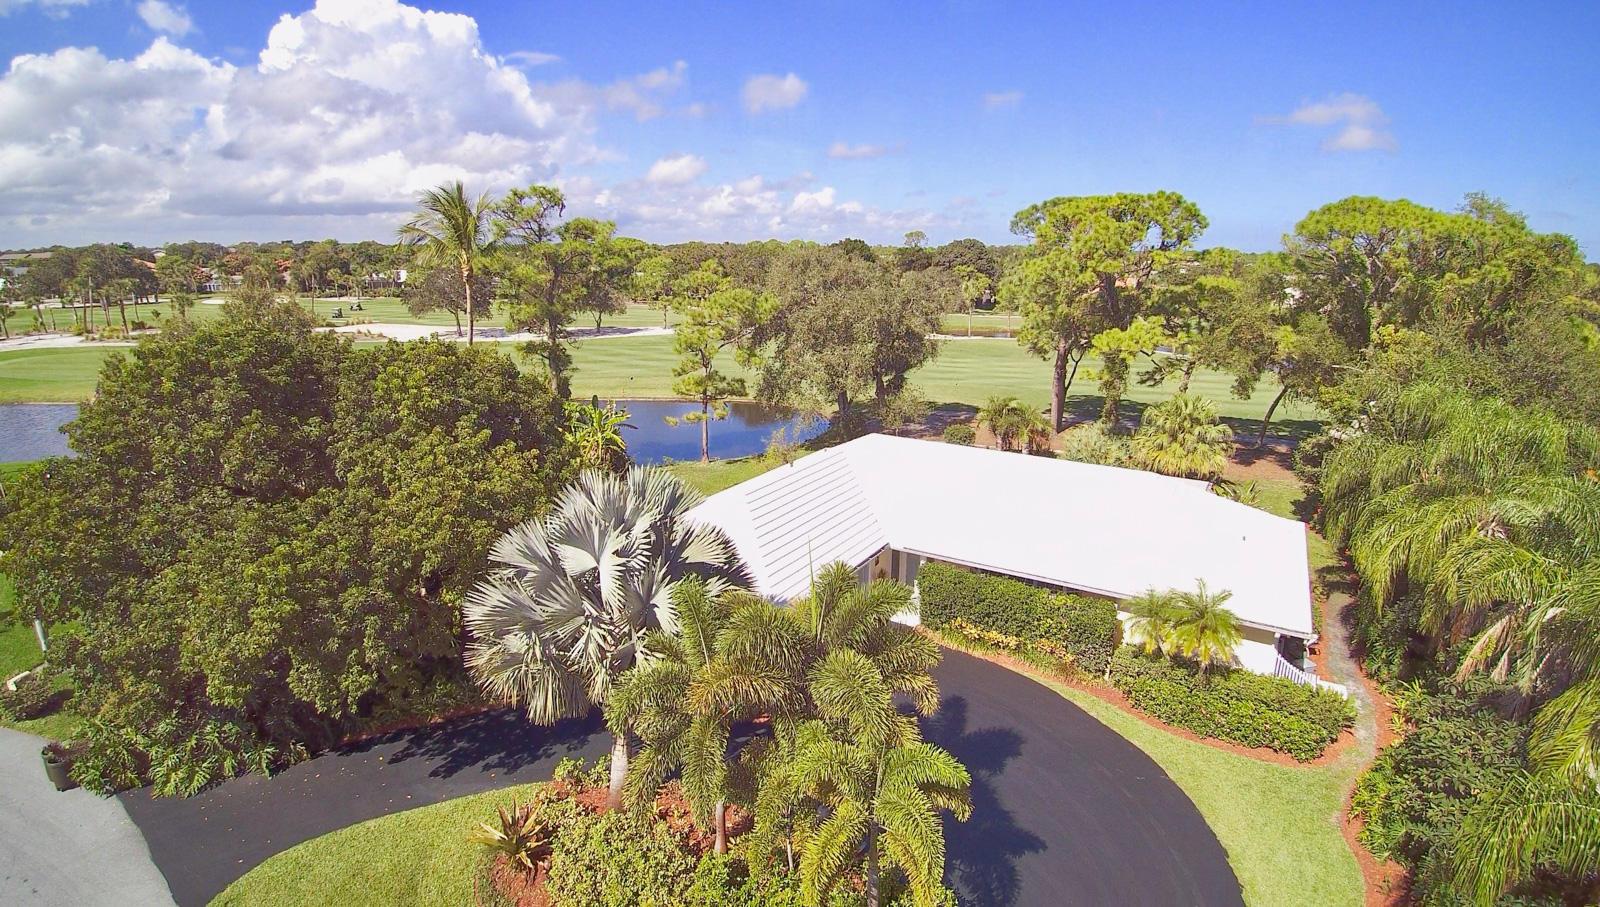 78 Turtle Creek Drive, Tequesta, Florida 33469, 2 Bedrooms Bedrooms, ,2 BathroomsBathrooms,A,Single family,Turtle Creek,RX-10482899